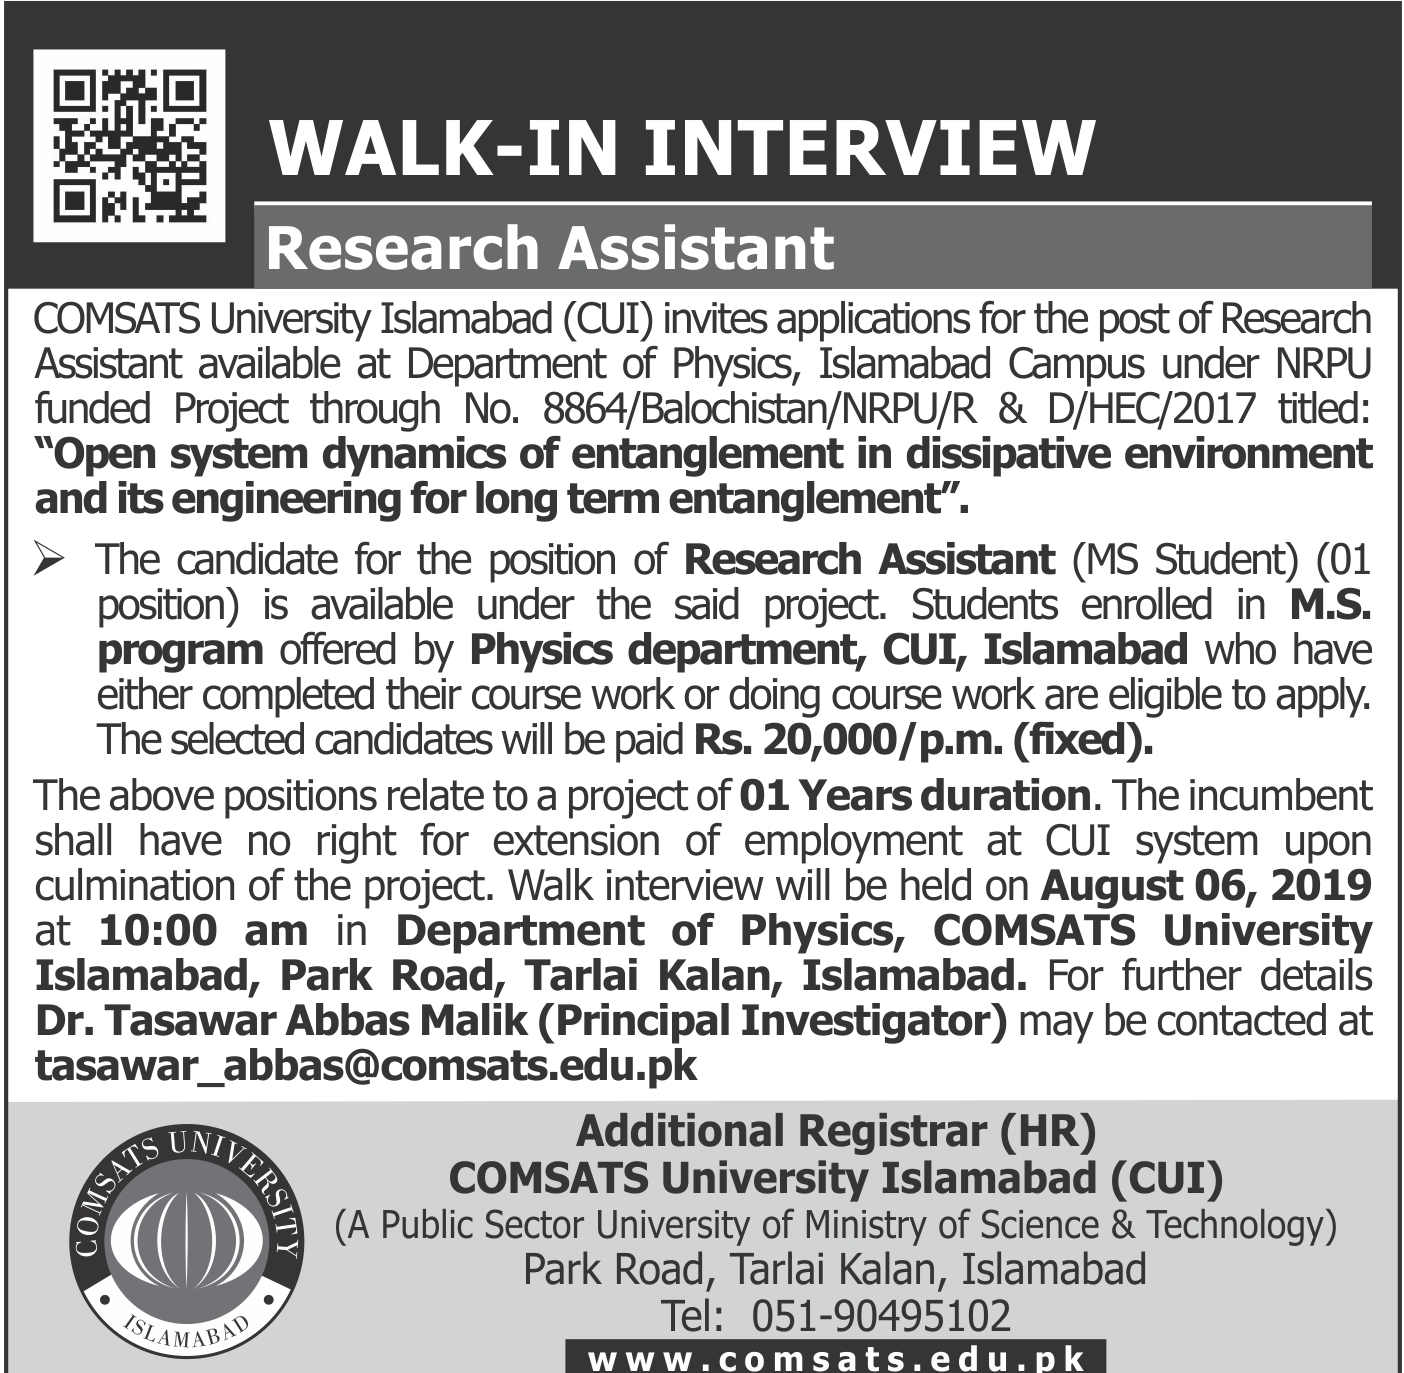 COMSATS University Islamabad (CUI)